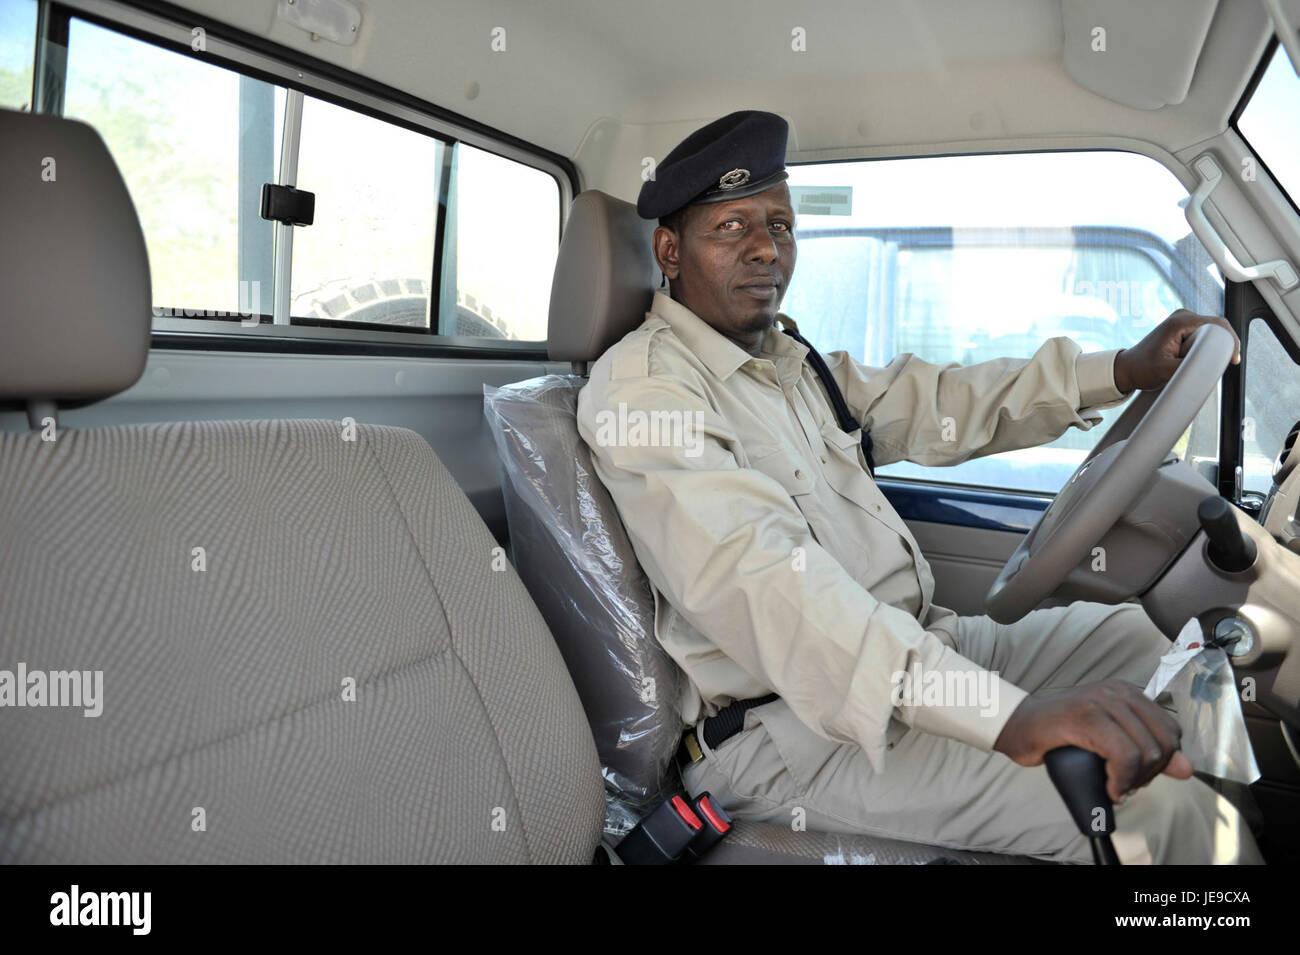 2014 03 01 Vehicles Handover-25 (12853568953) - Stock Image